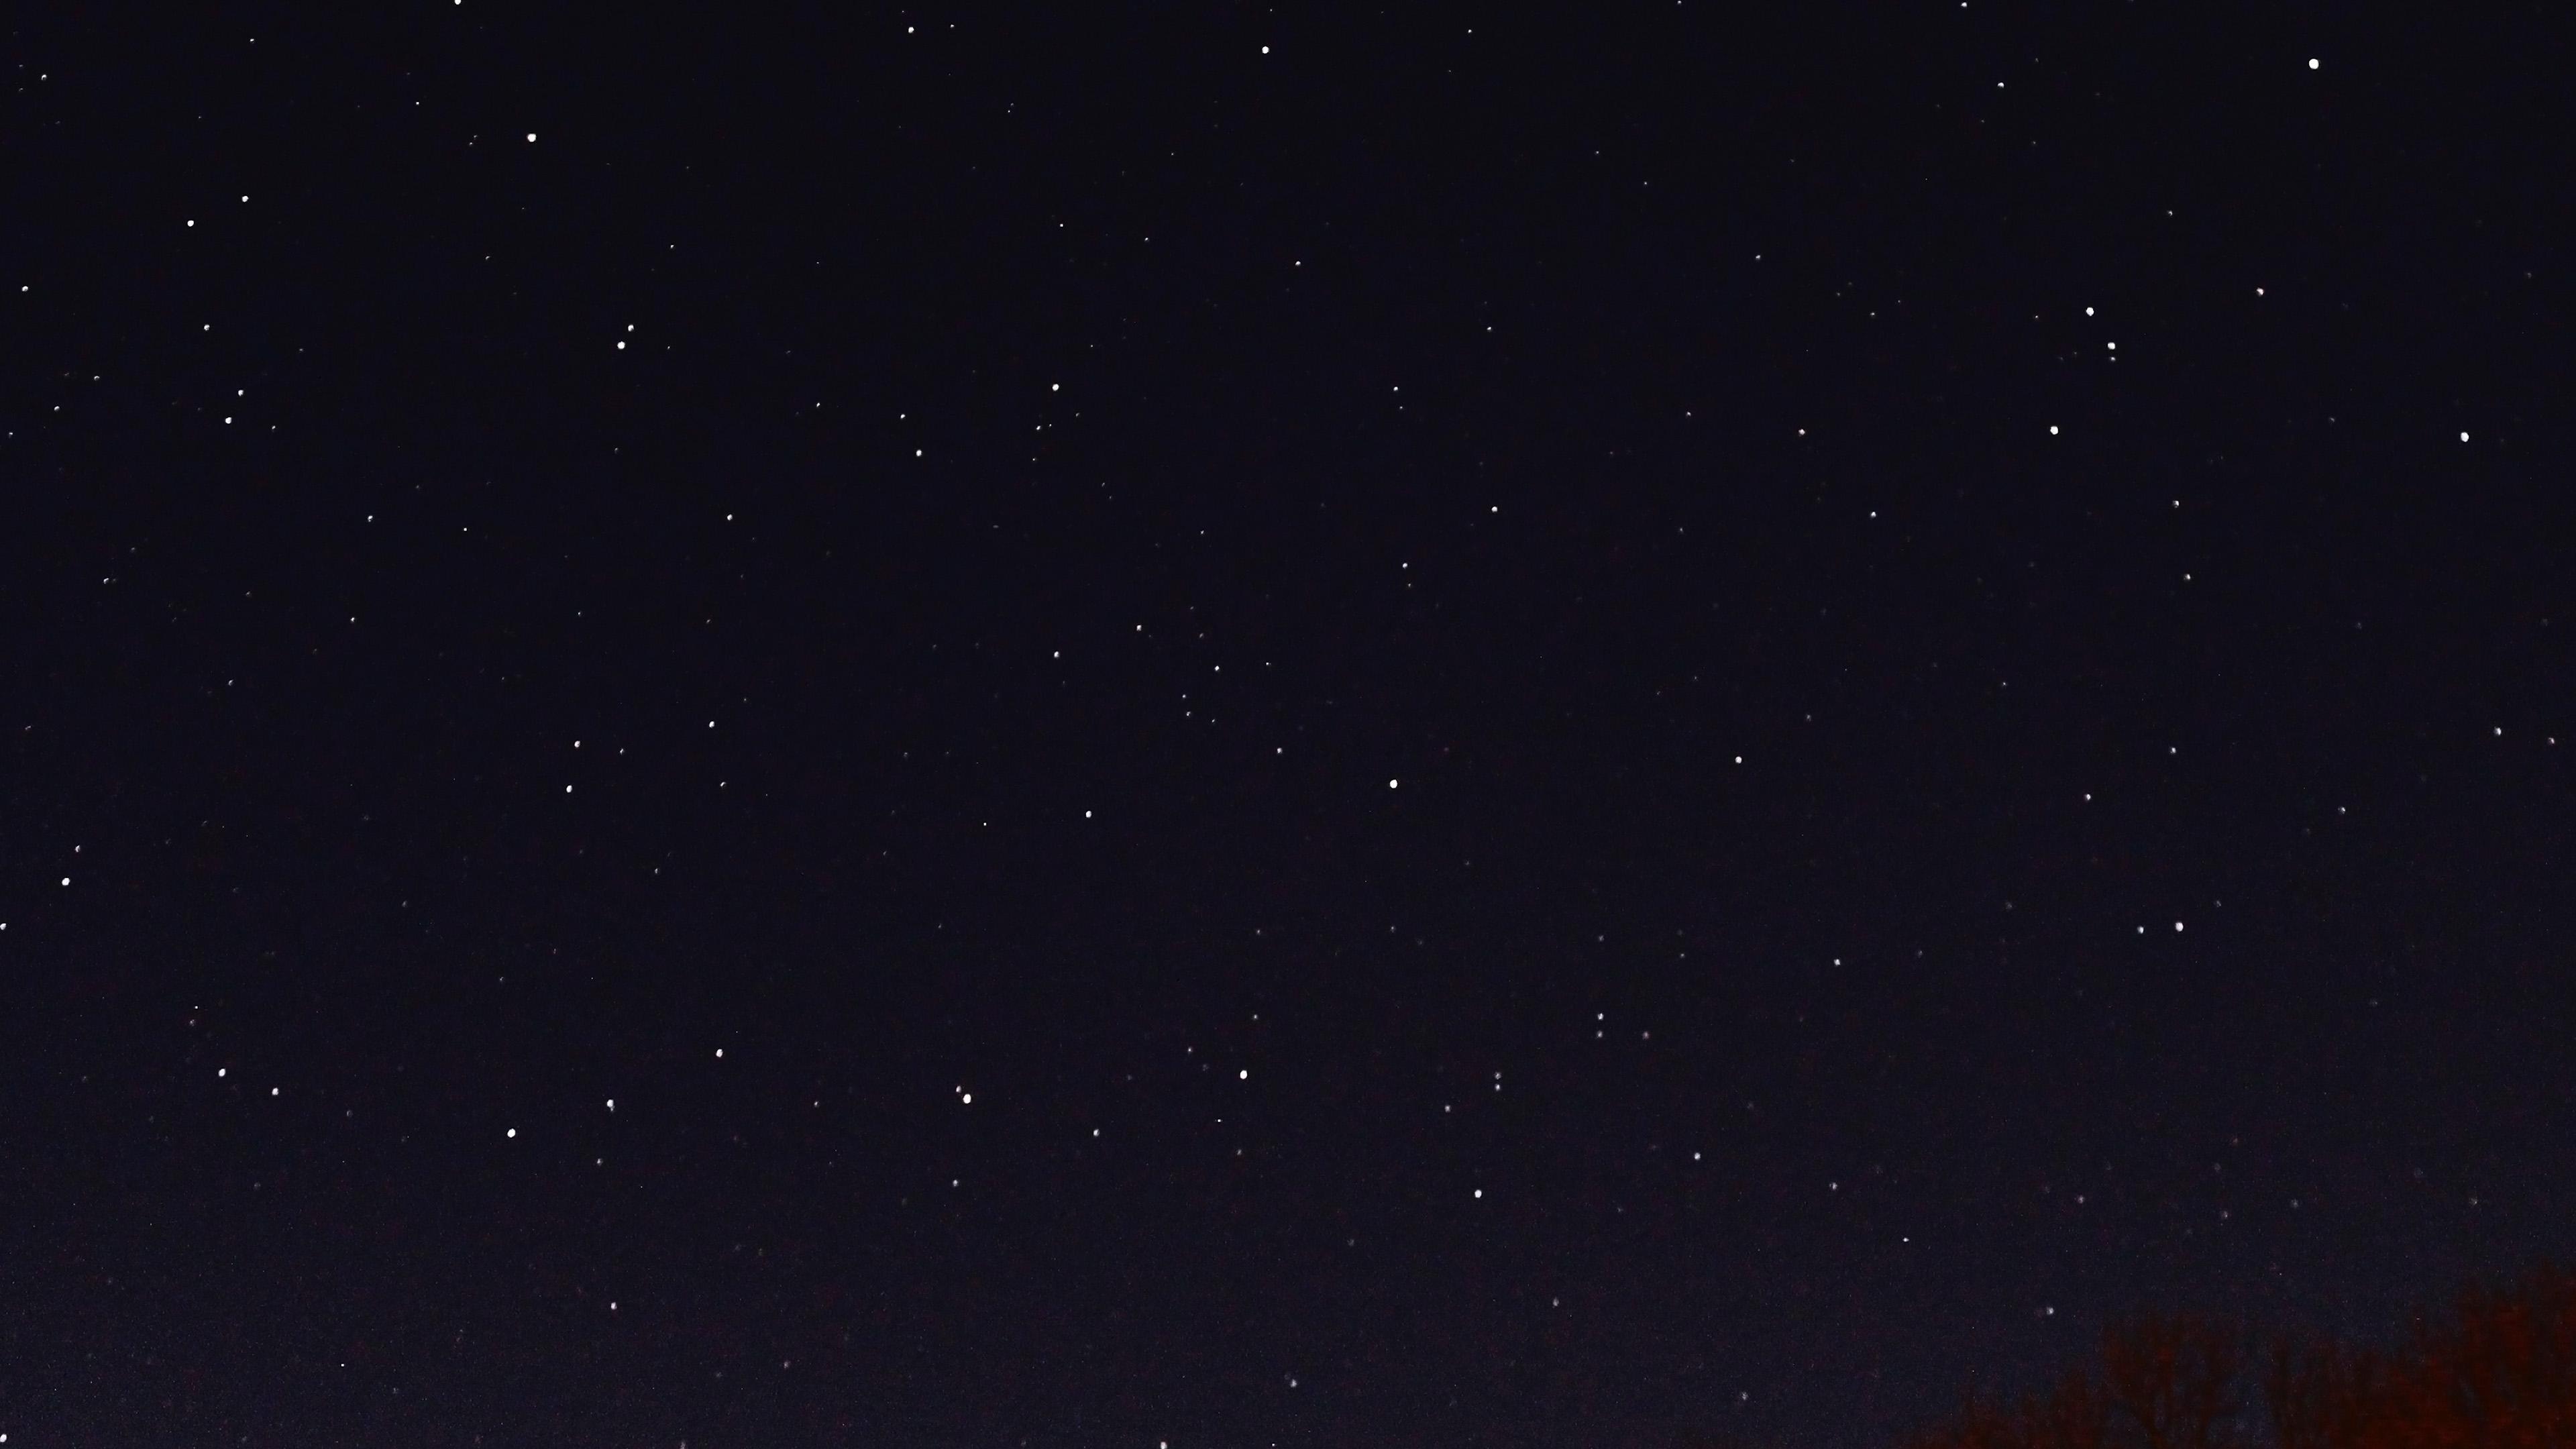 nc26-night-sky-dark-star-lights-tree-nature-wallpaper